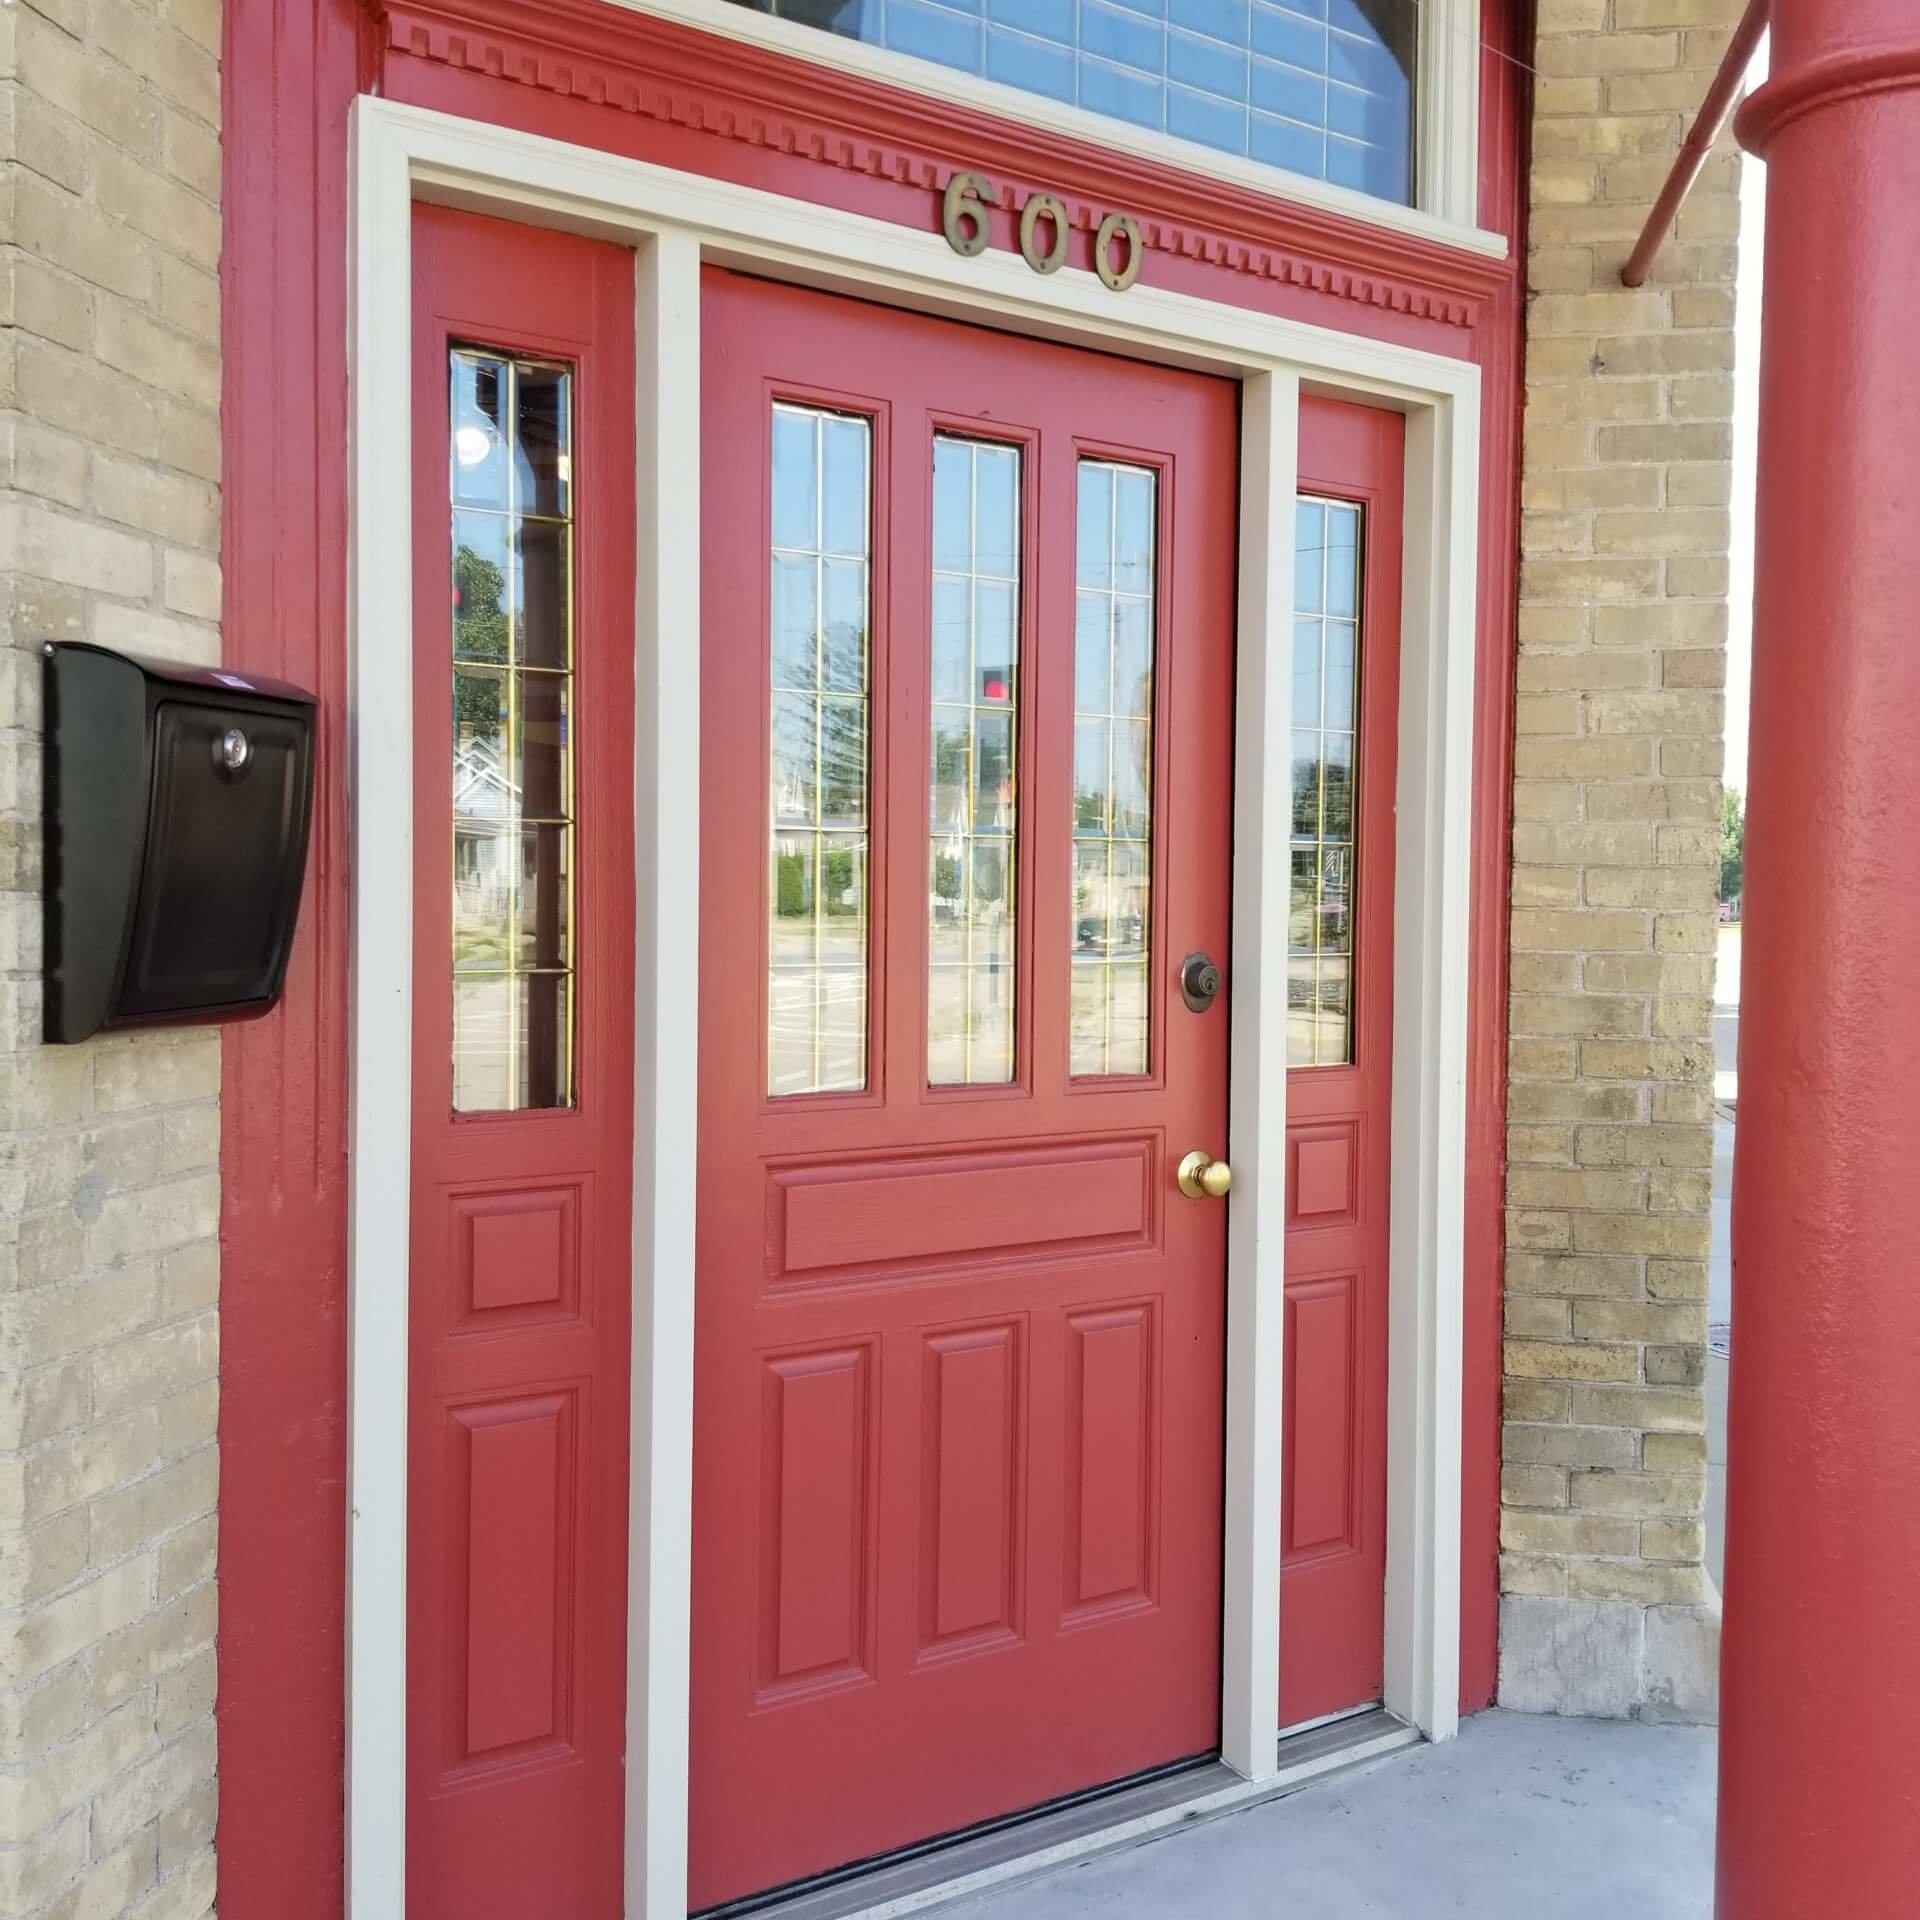 600 Ohio Street, Oshkosh, Wisconsin - E/Power Marketing's front door